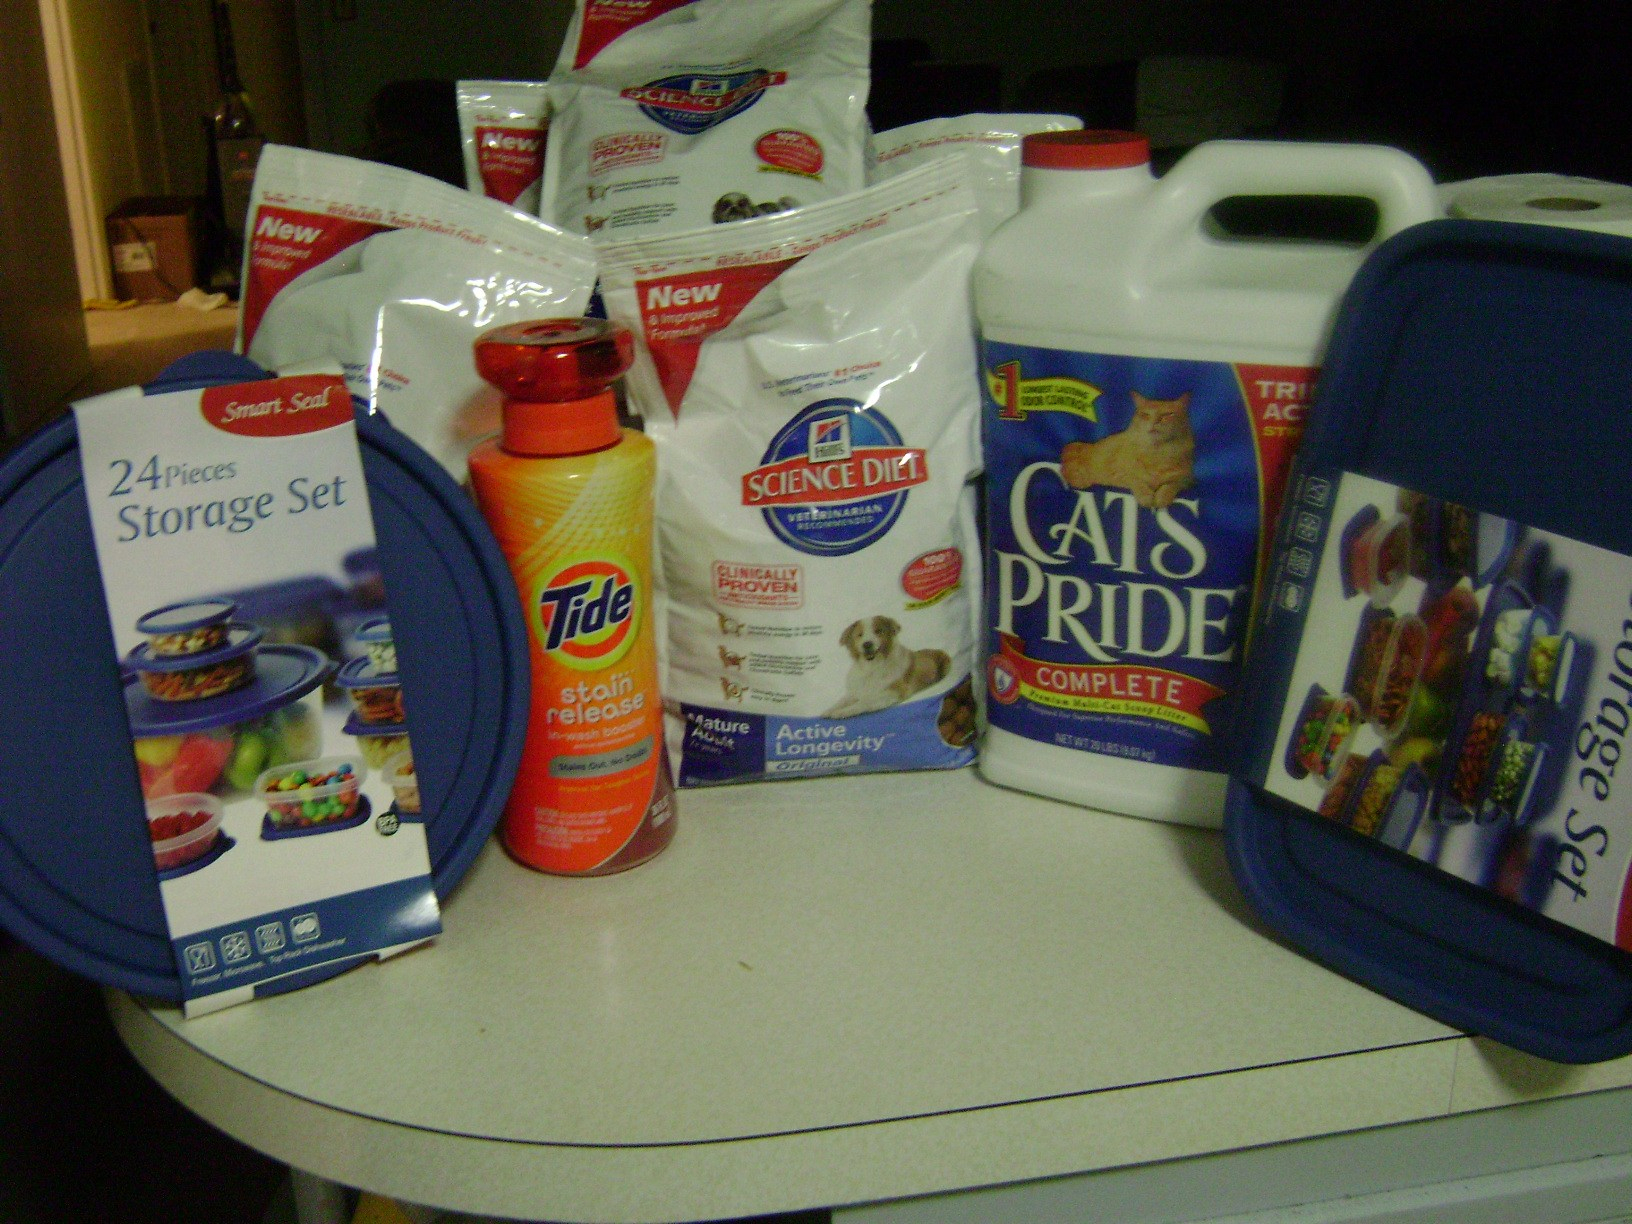 Hills Science Dog Food Coupons - Free Printable Science Diet Dog Food Coupons